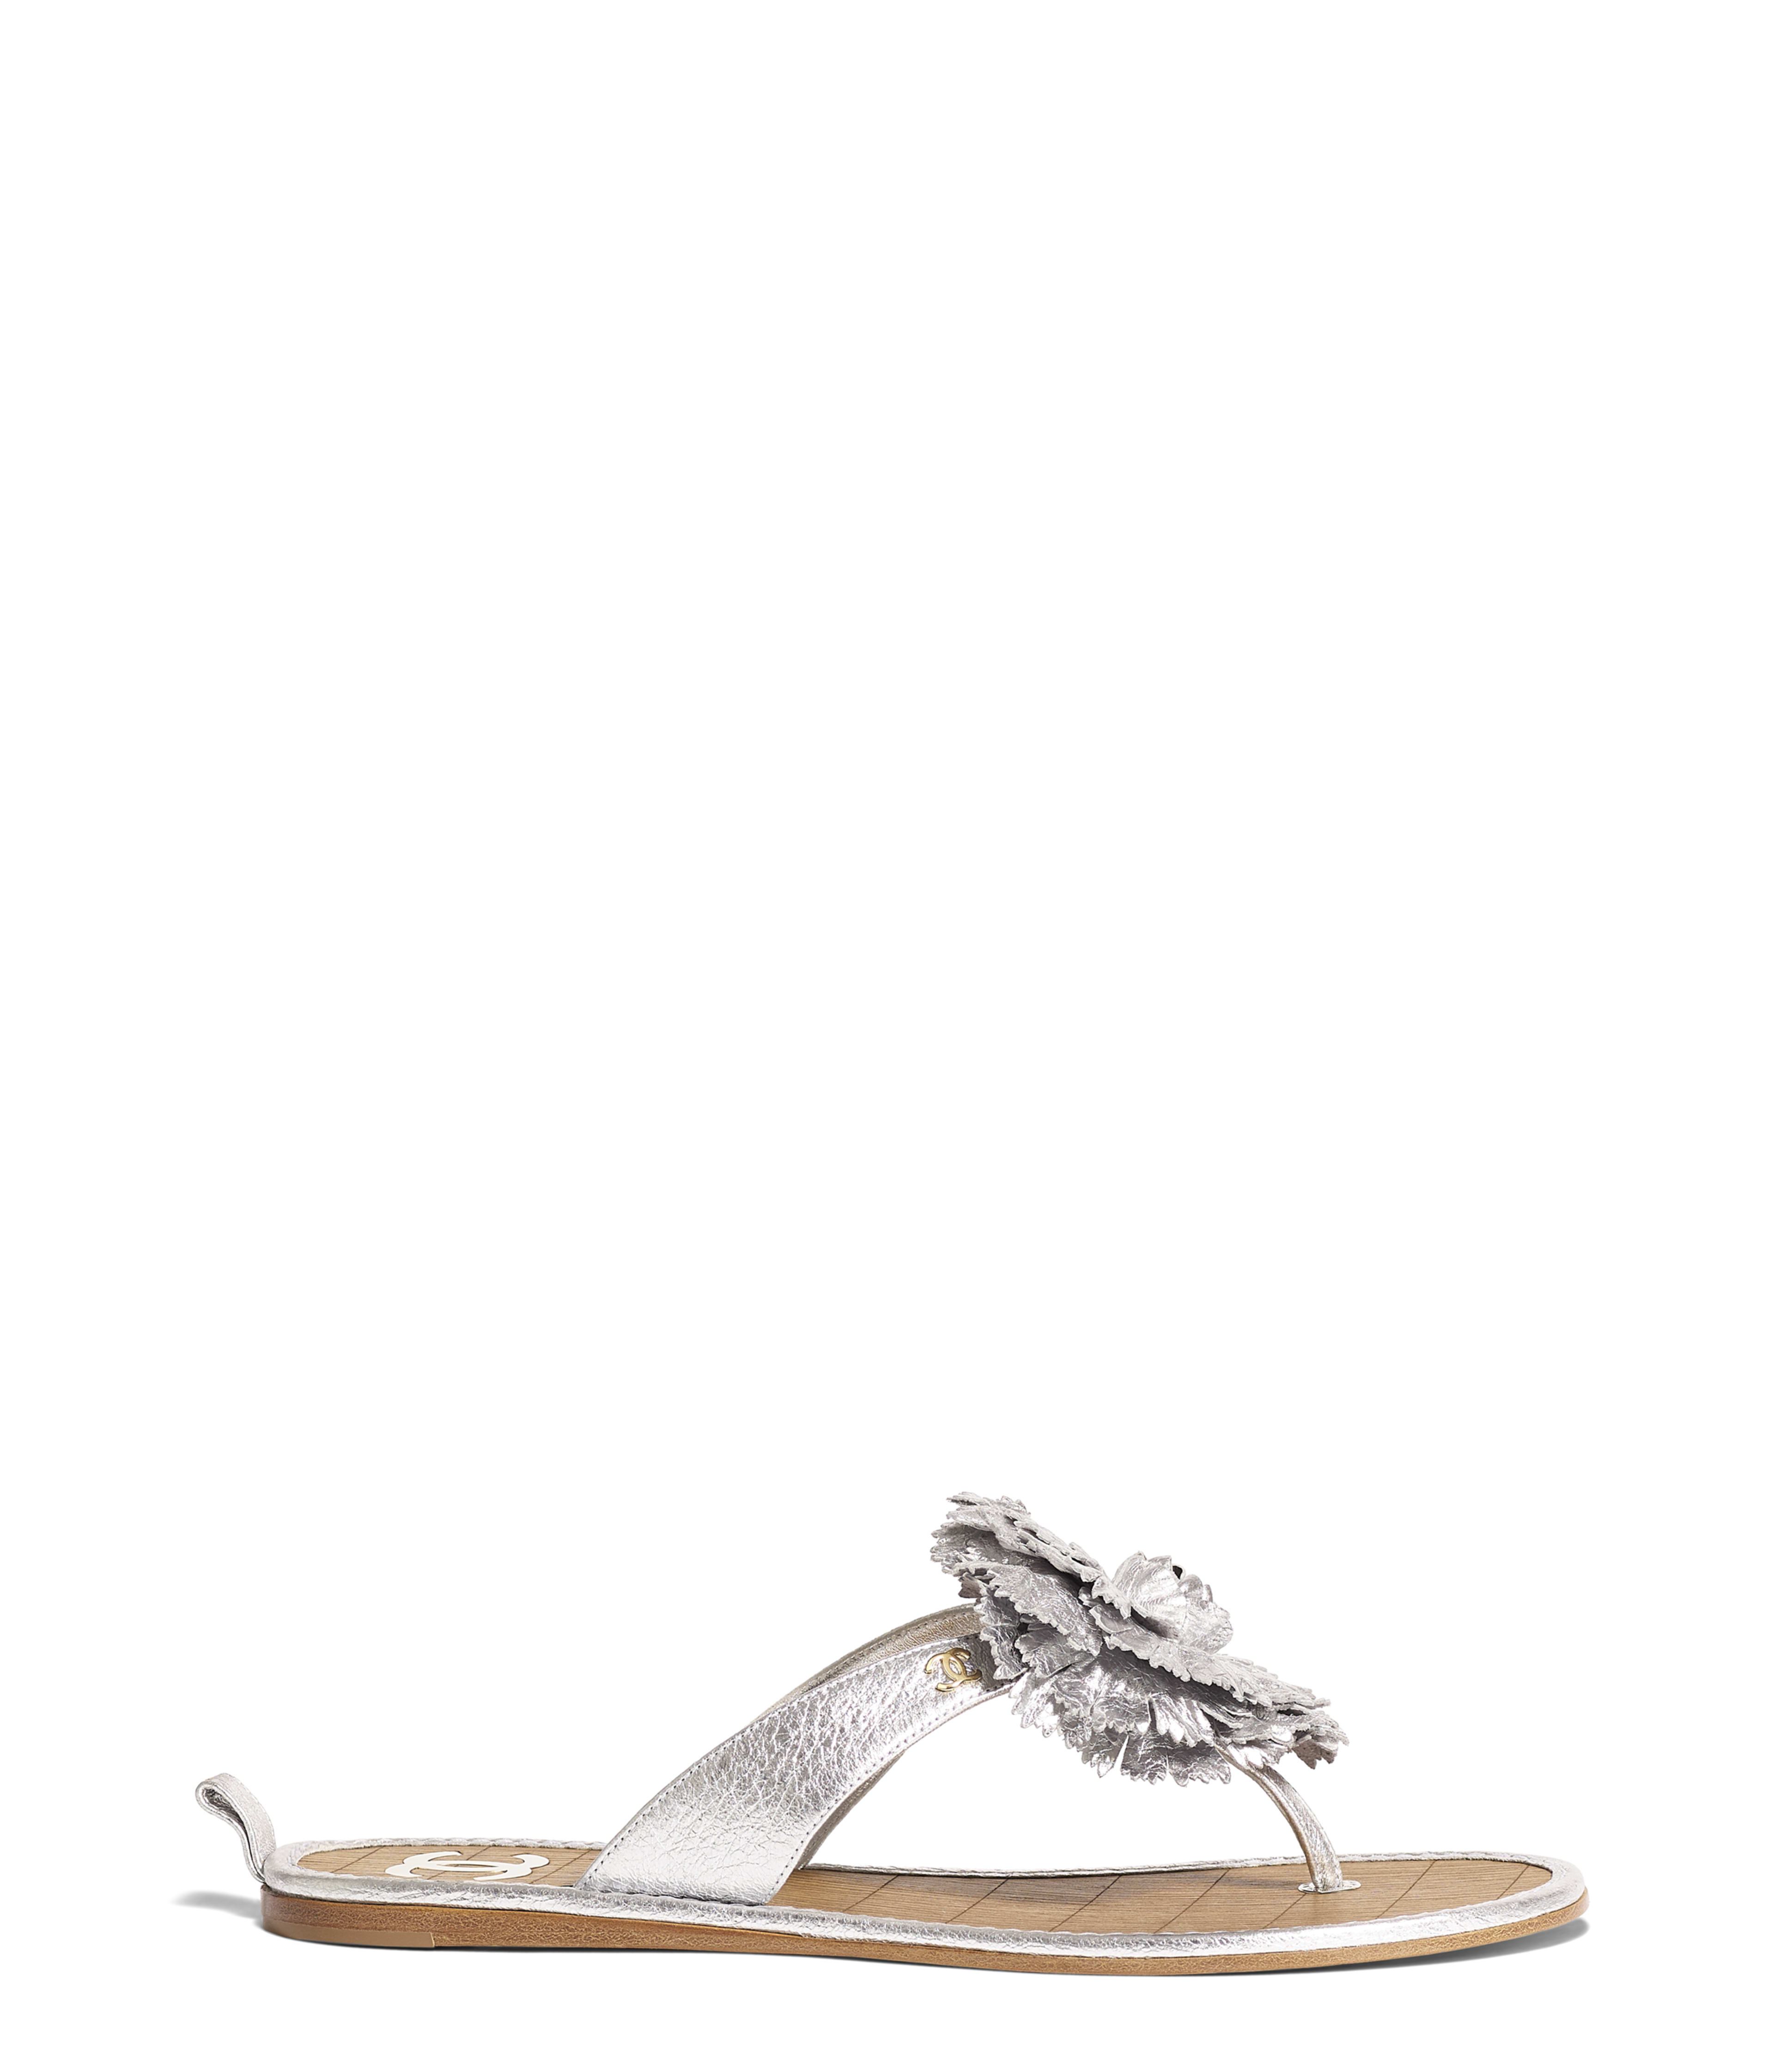 Sandals Laminated Crumpled Goatskin 60fe67f5c